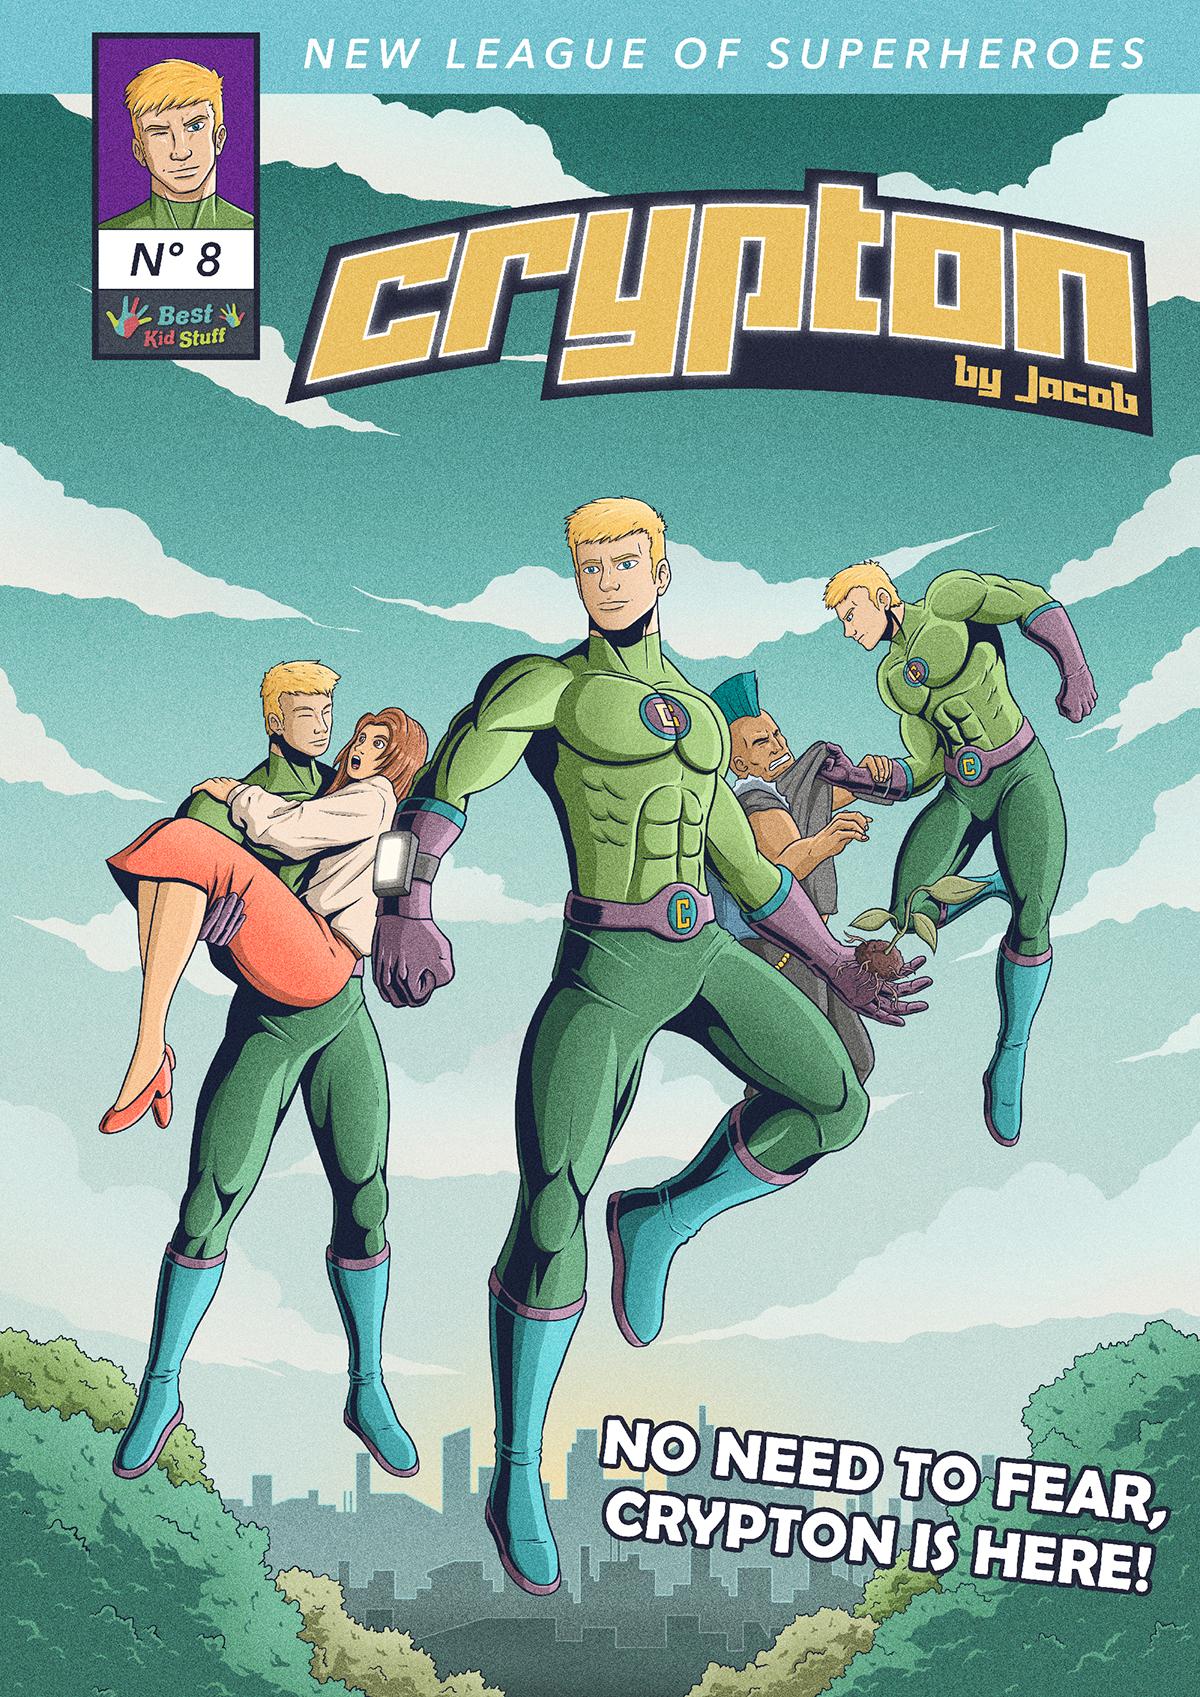 08 New League of Superheroes Crypton